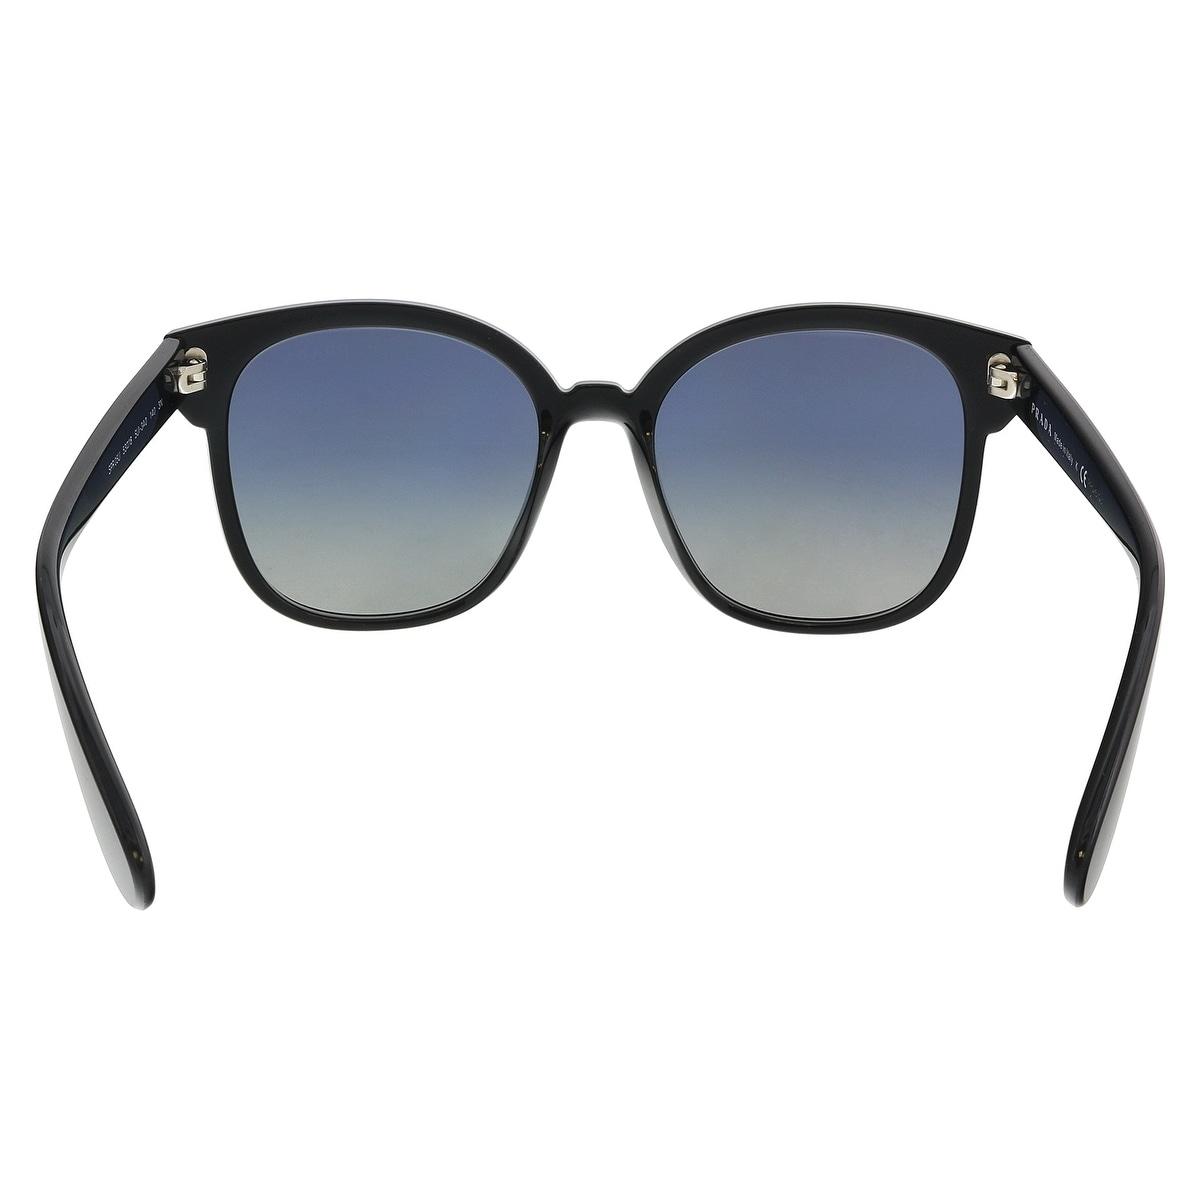 39cb0035d4d8 ... uk shop prada pr 05us sui3a0 black blue yellow square sunglasses 53 18  140 free shipping